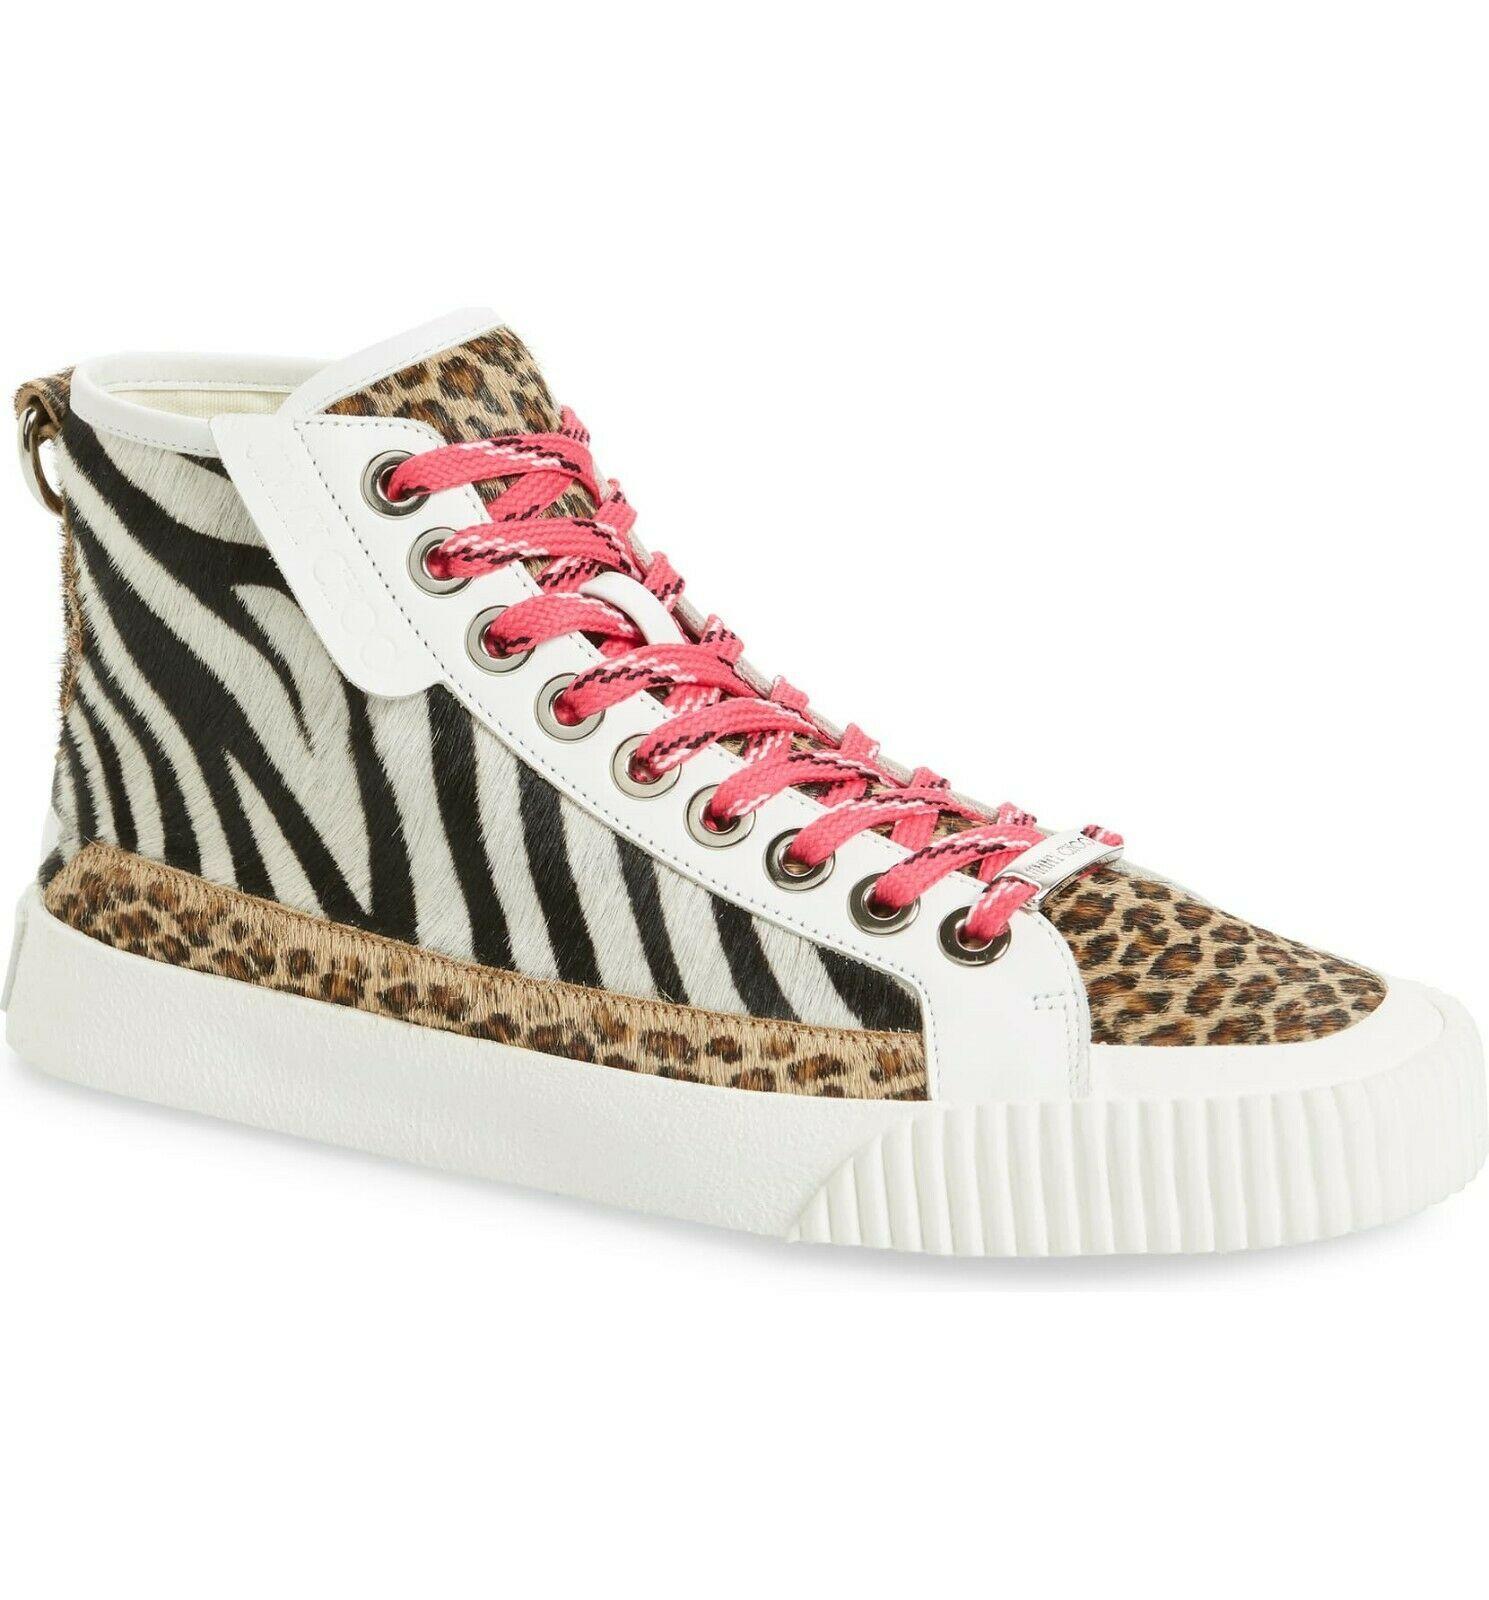 Jimmy Choo Impala Calf Hair High Top Sneakers Size 38.5 MSRP: $775.00 - $470.25